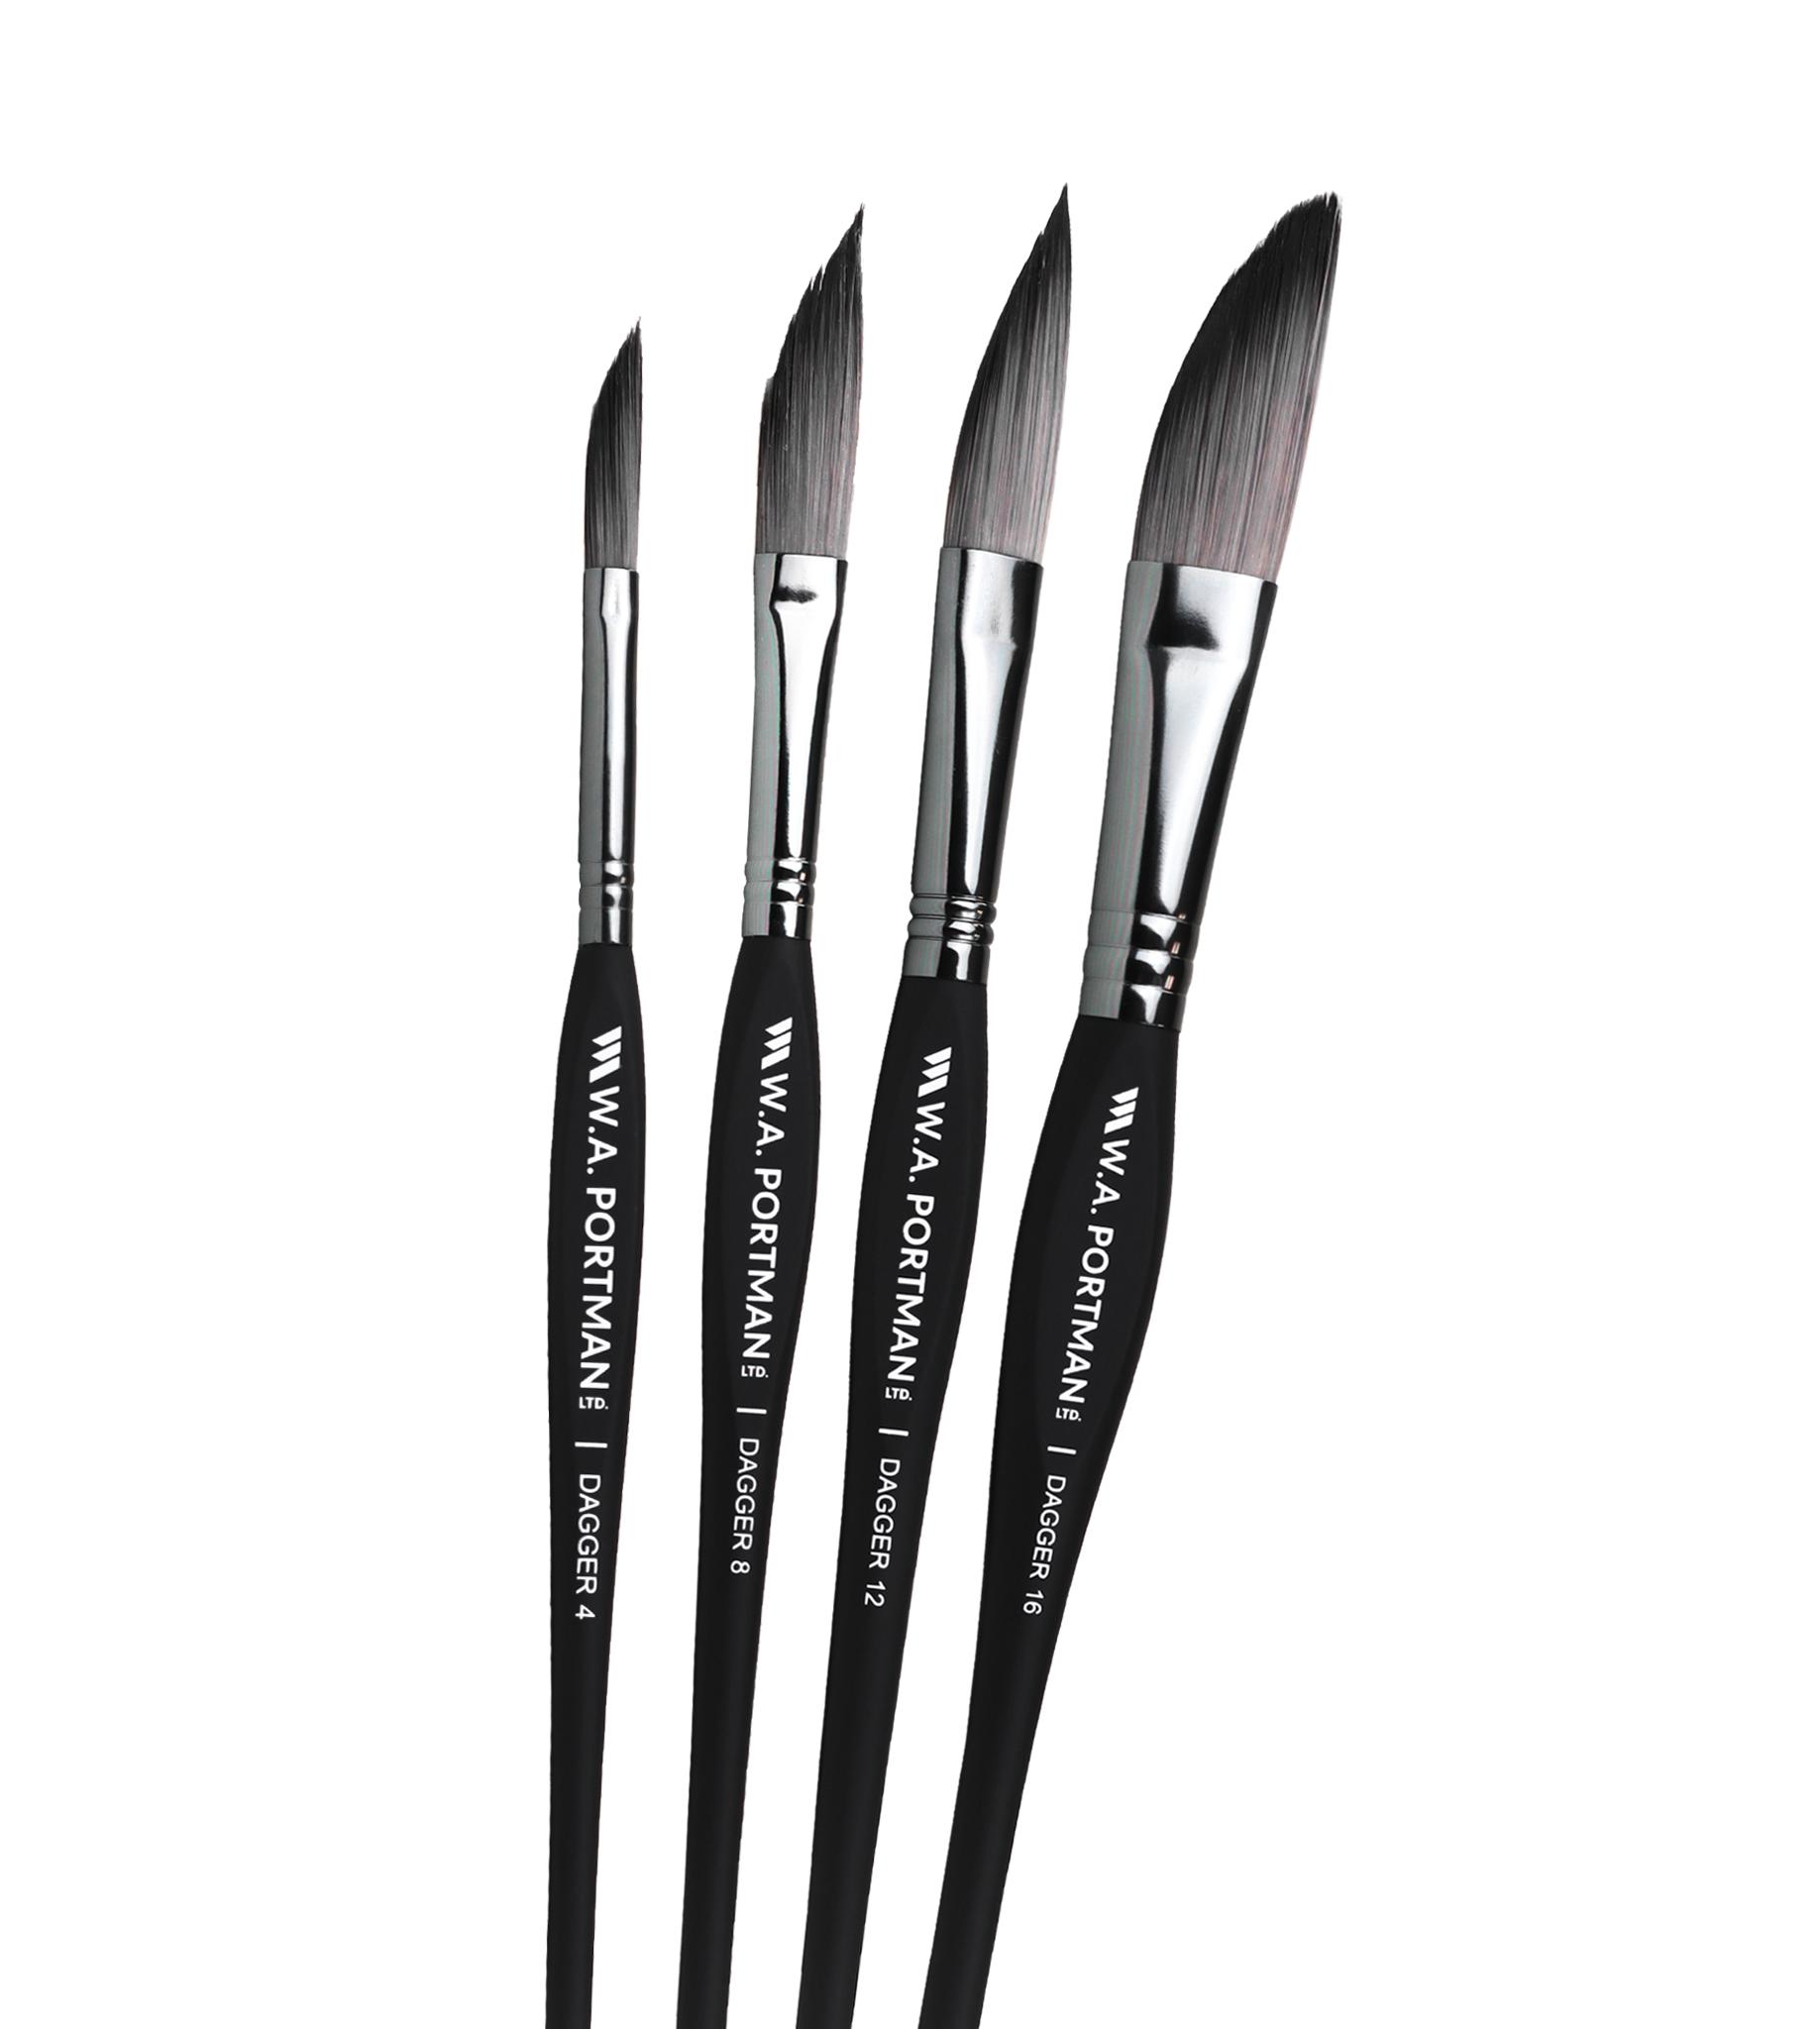 W.A. Portman Dagger Brushes 4pc